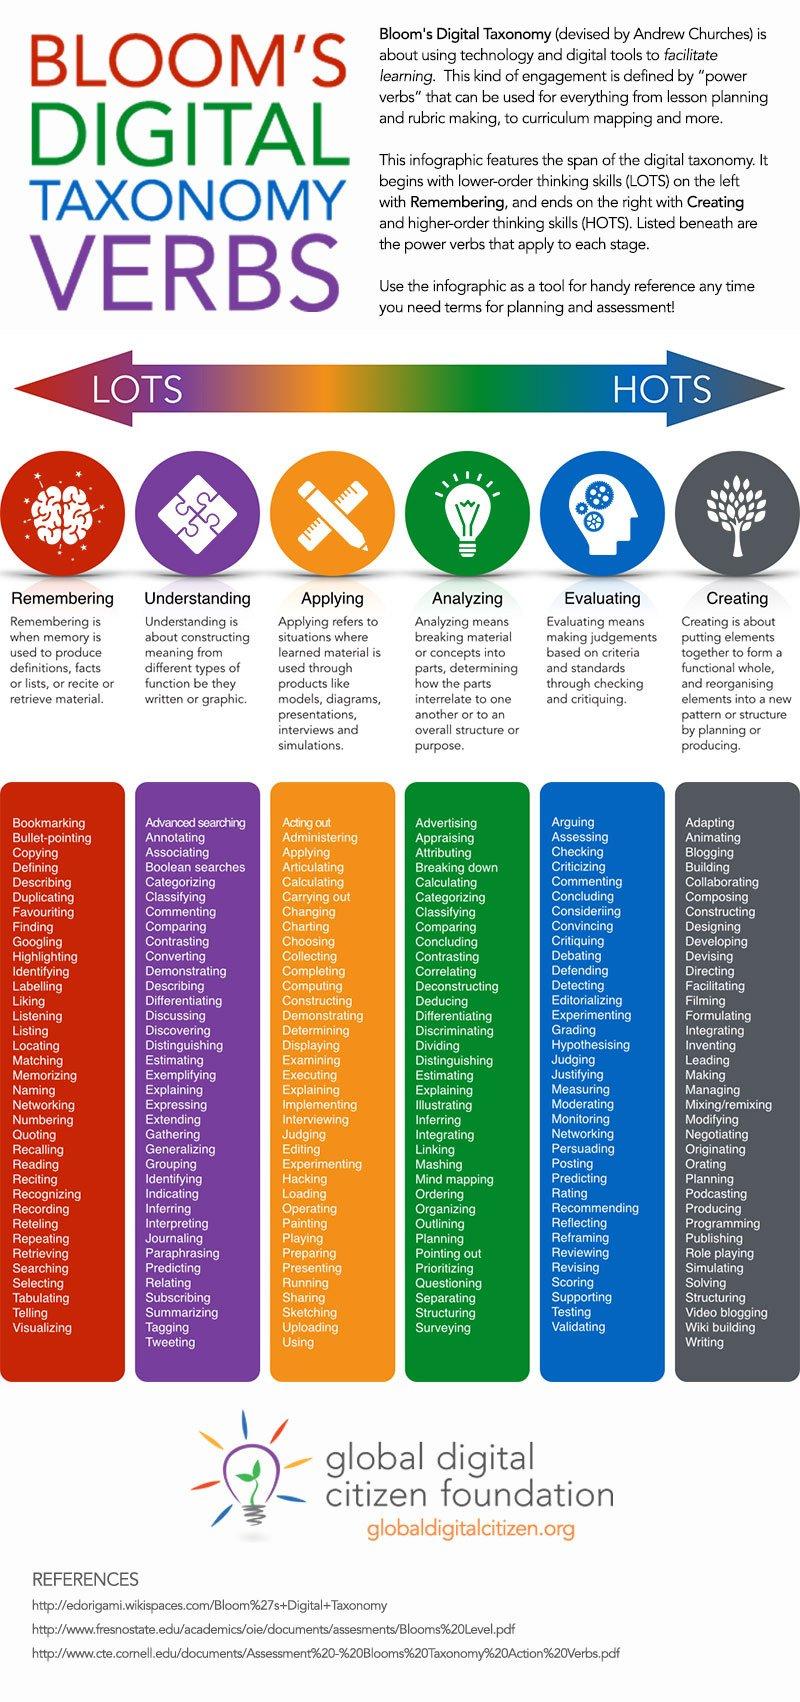 Bloom's Digital Taxonomy Verbs #TTPlay #ACUedu_p #aussieED https://t.co/OyFz8MByzq